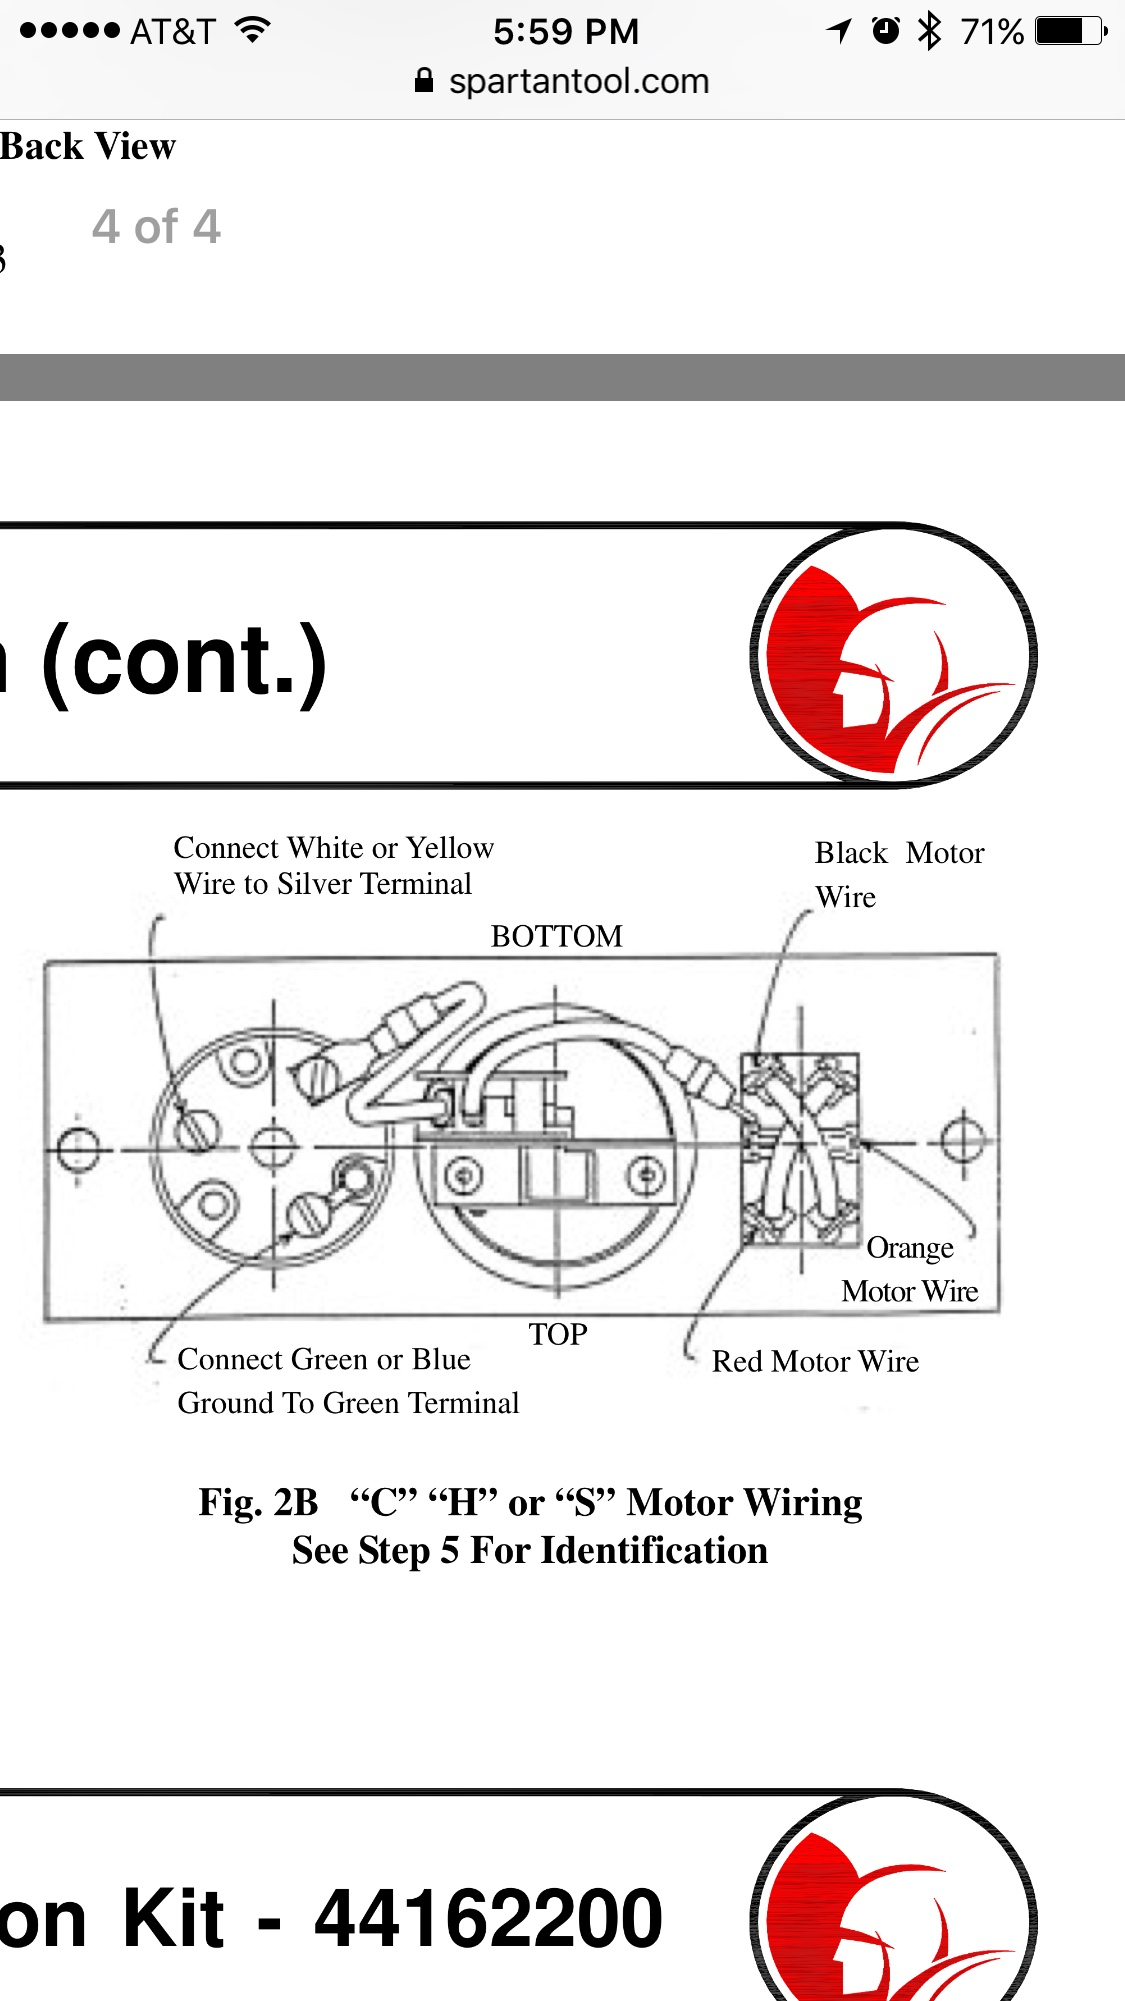 Spartan Wiring Diagram